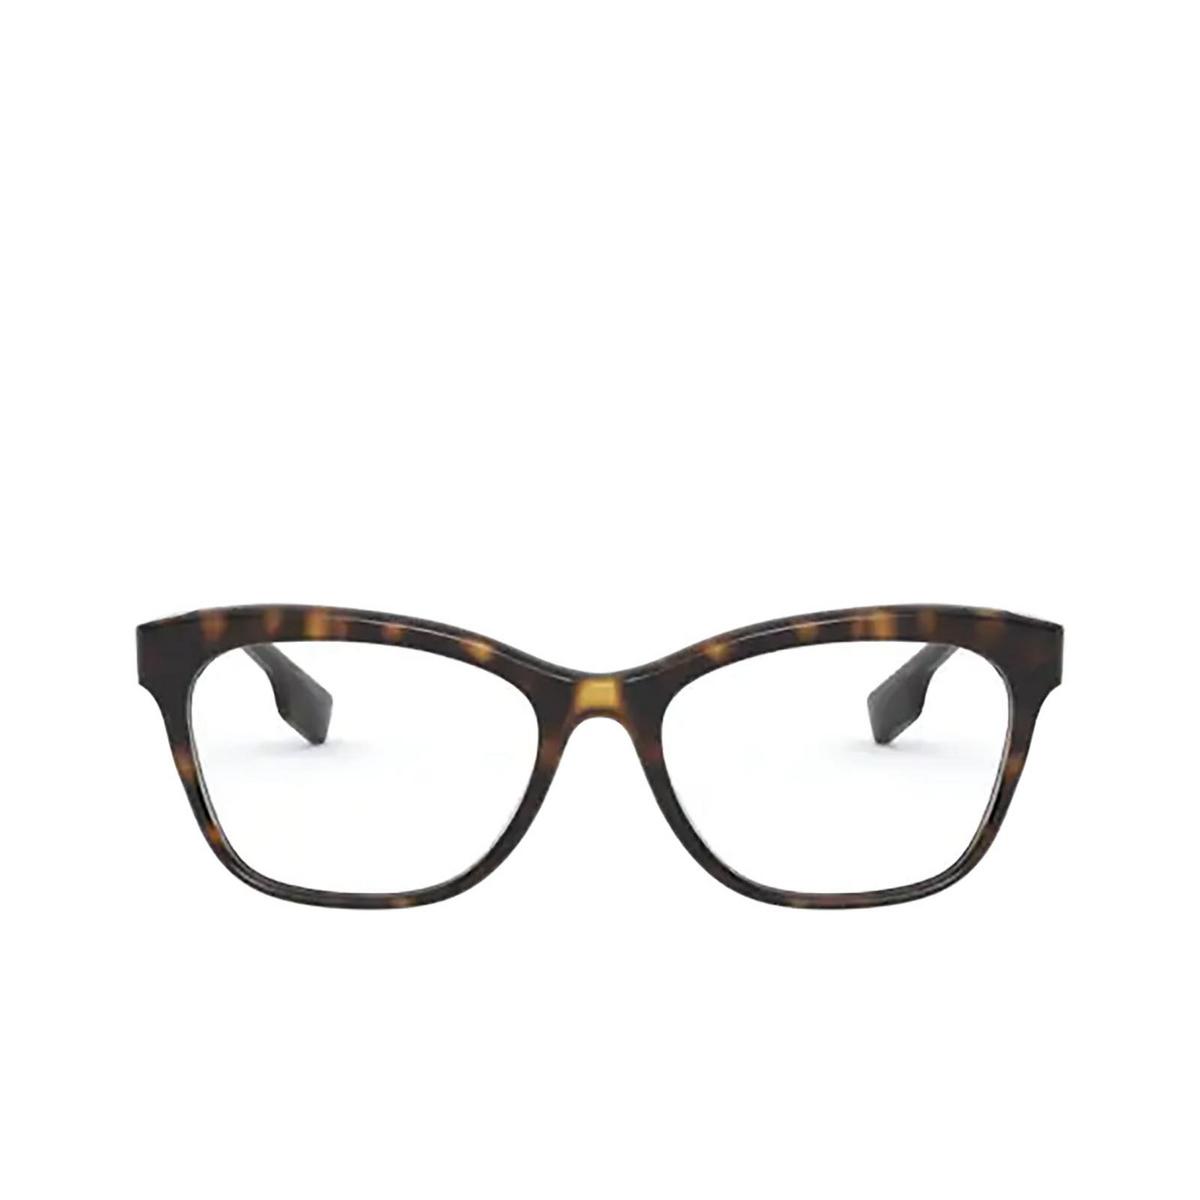 Burberry® Square Eyeglasses: Mildred BE2323 color Dark Havana 3002 - front view.